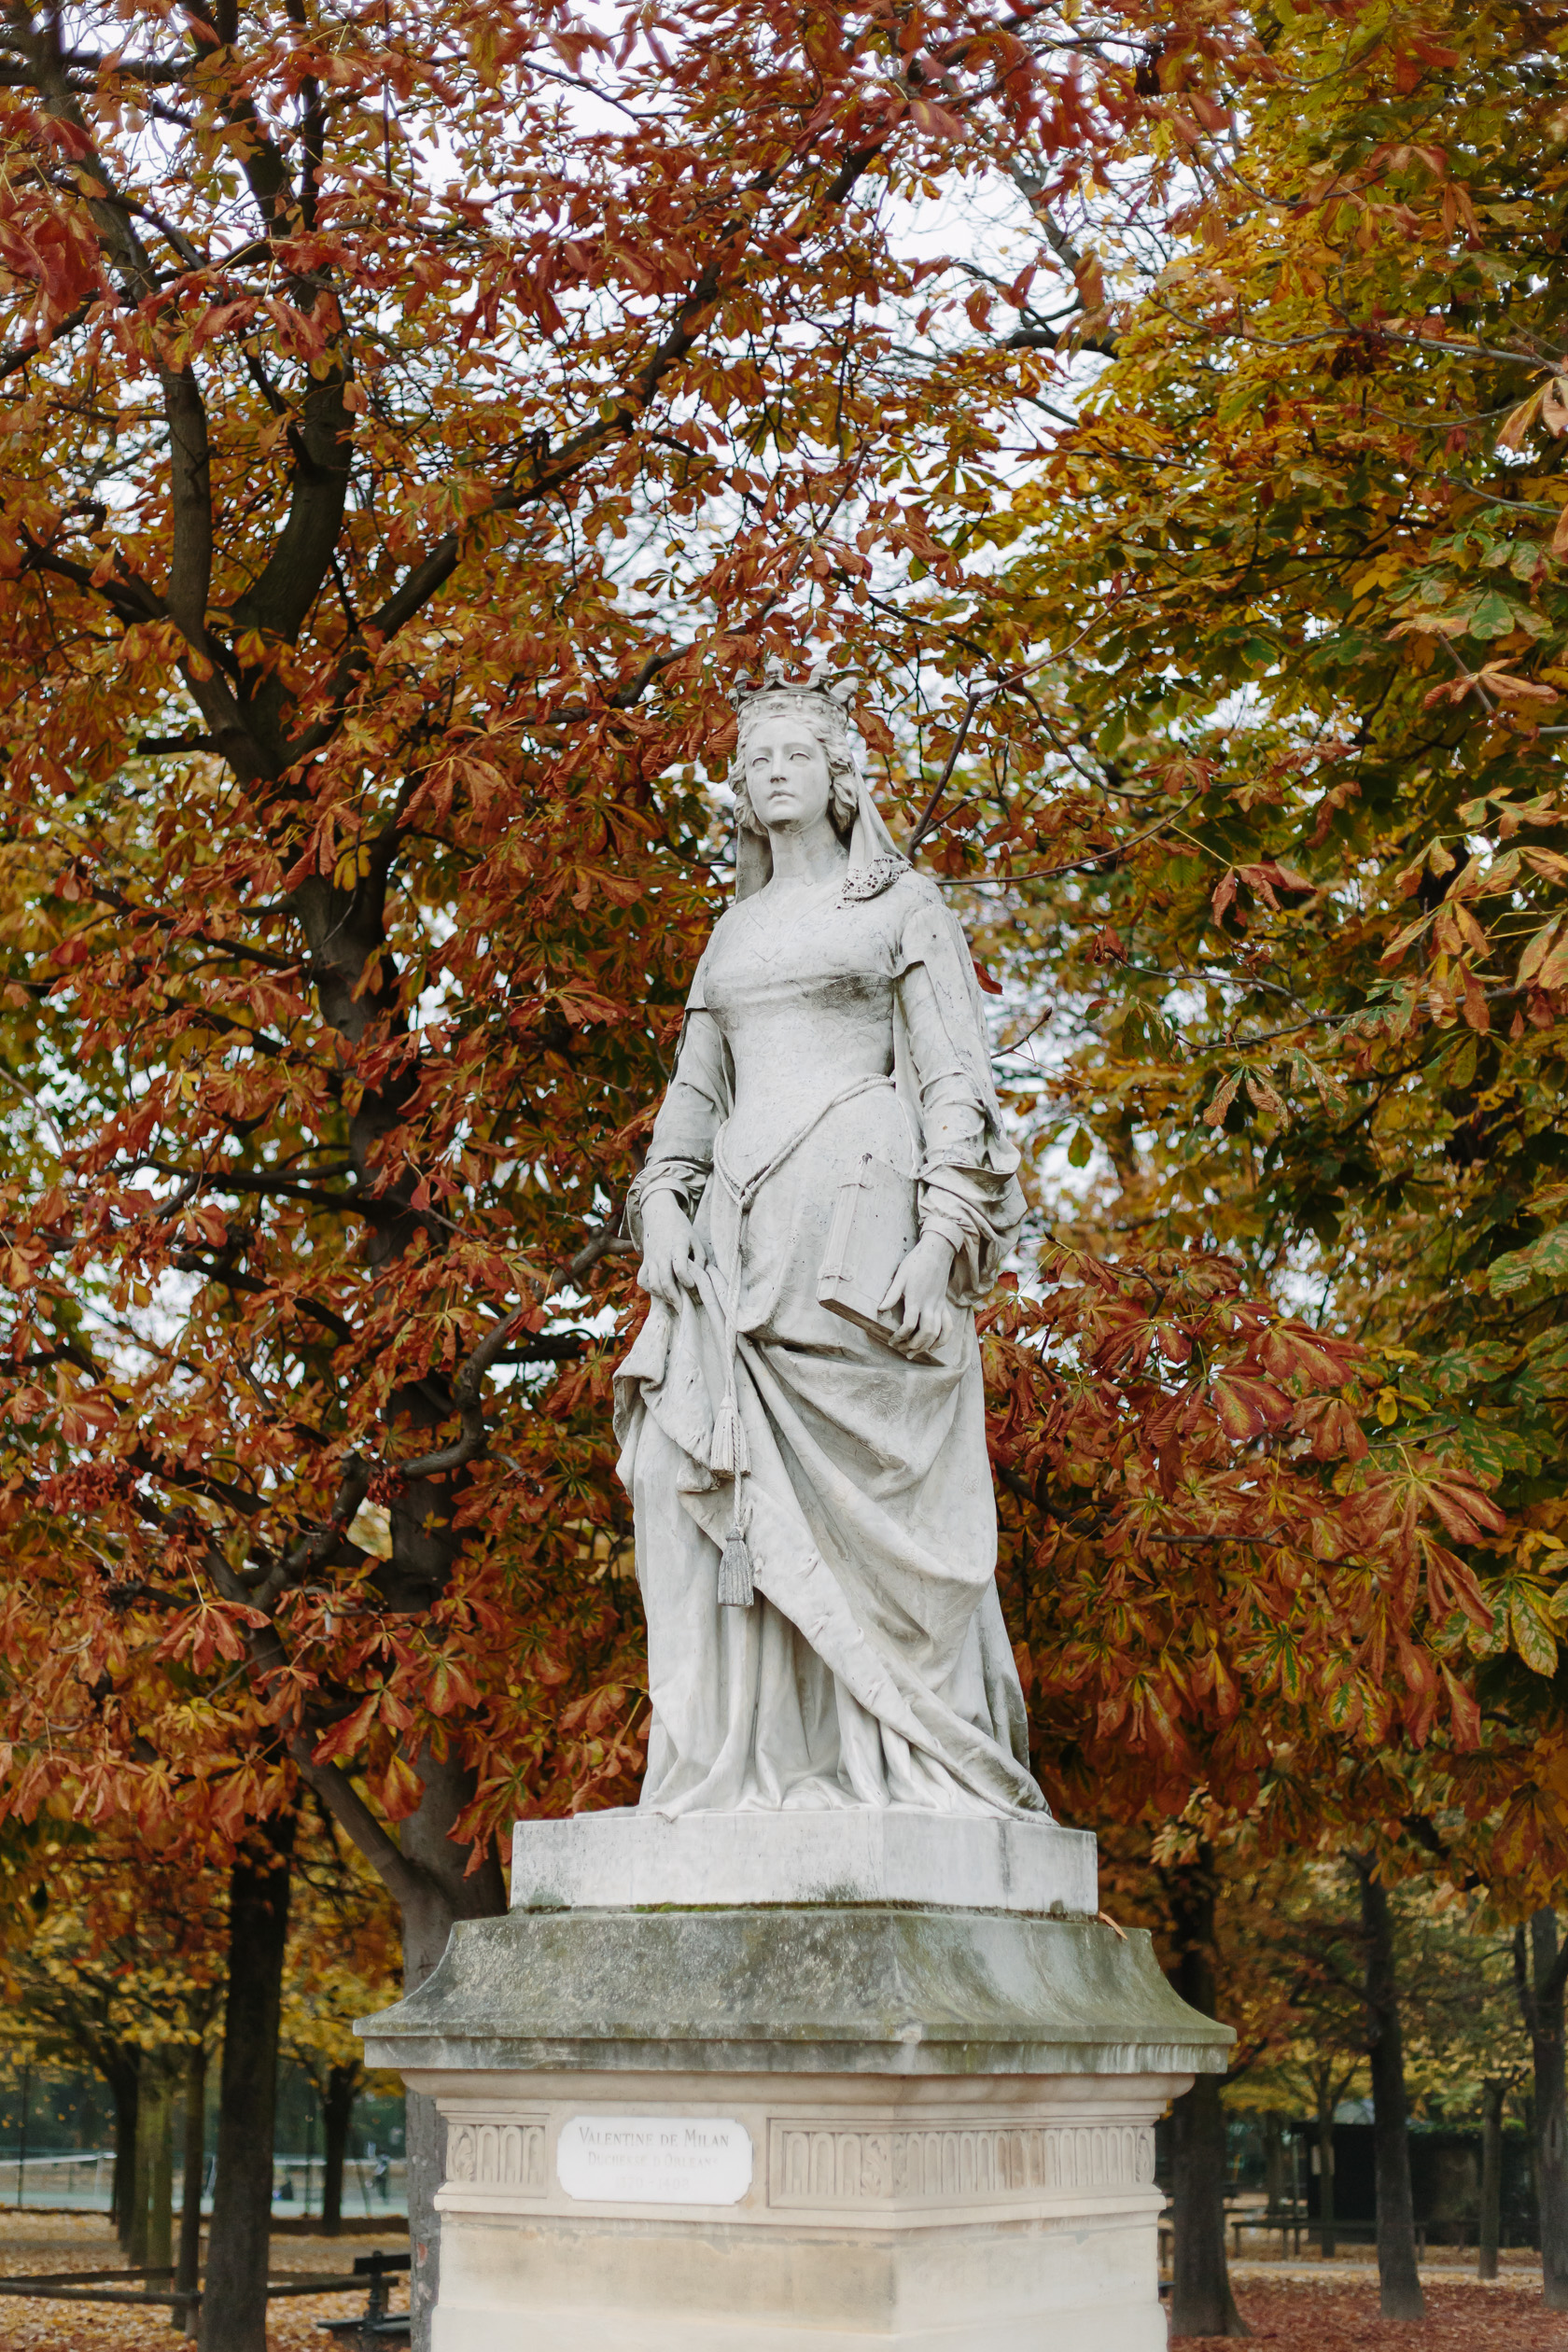 jardin-du-luxembourg-paris-4955